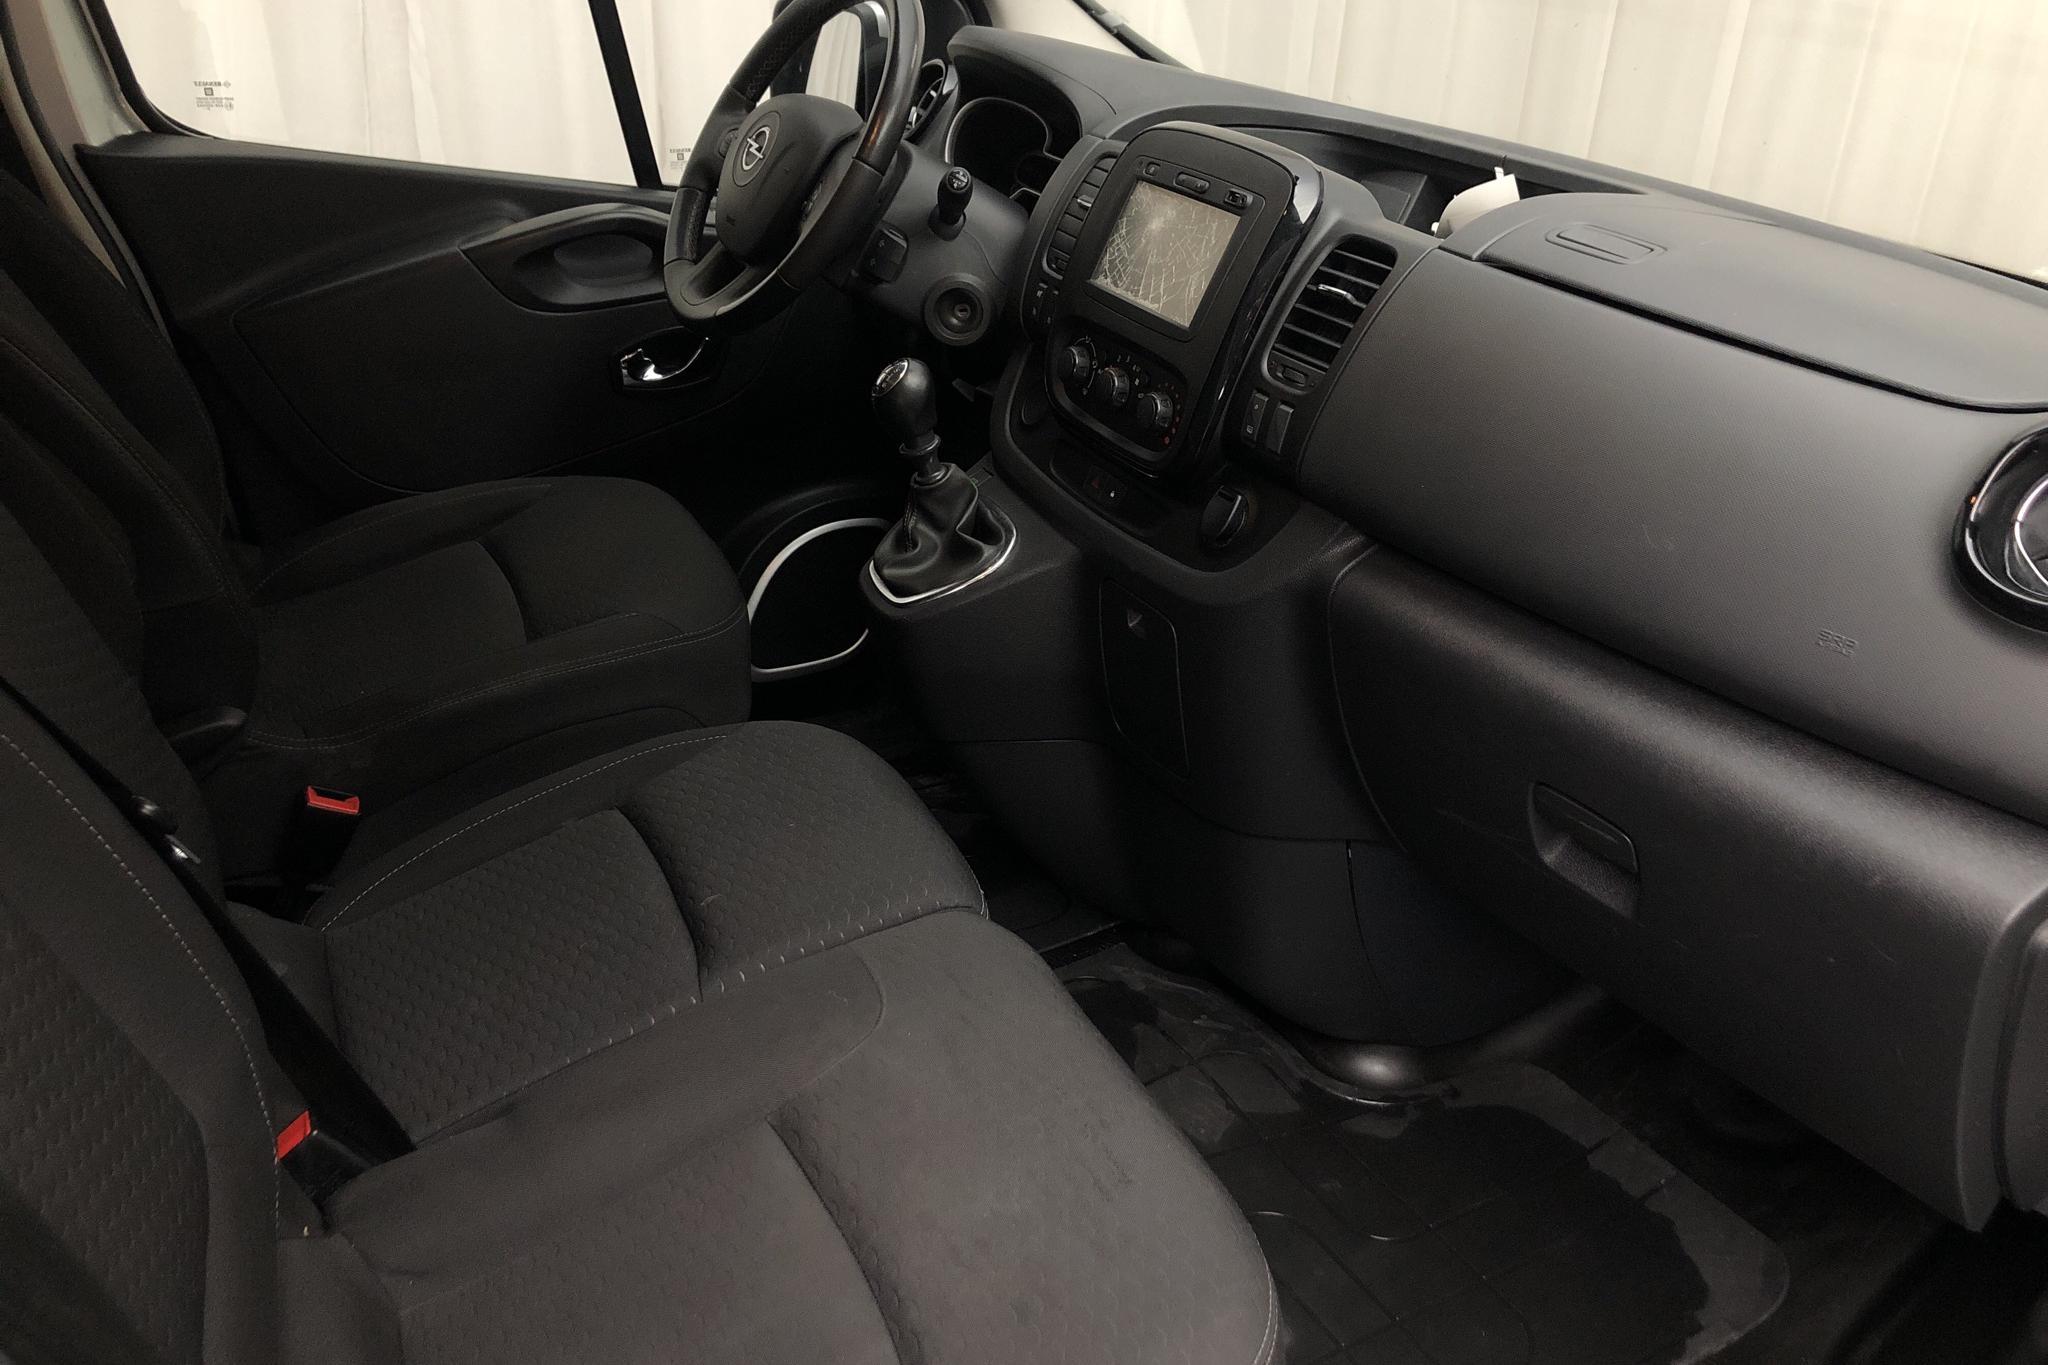 Opel Vivaro 1.6 CDTI (120hk) - 150 240 km - Manual - gray - 2016